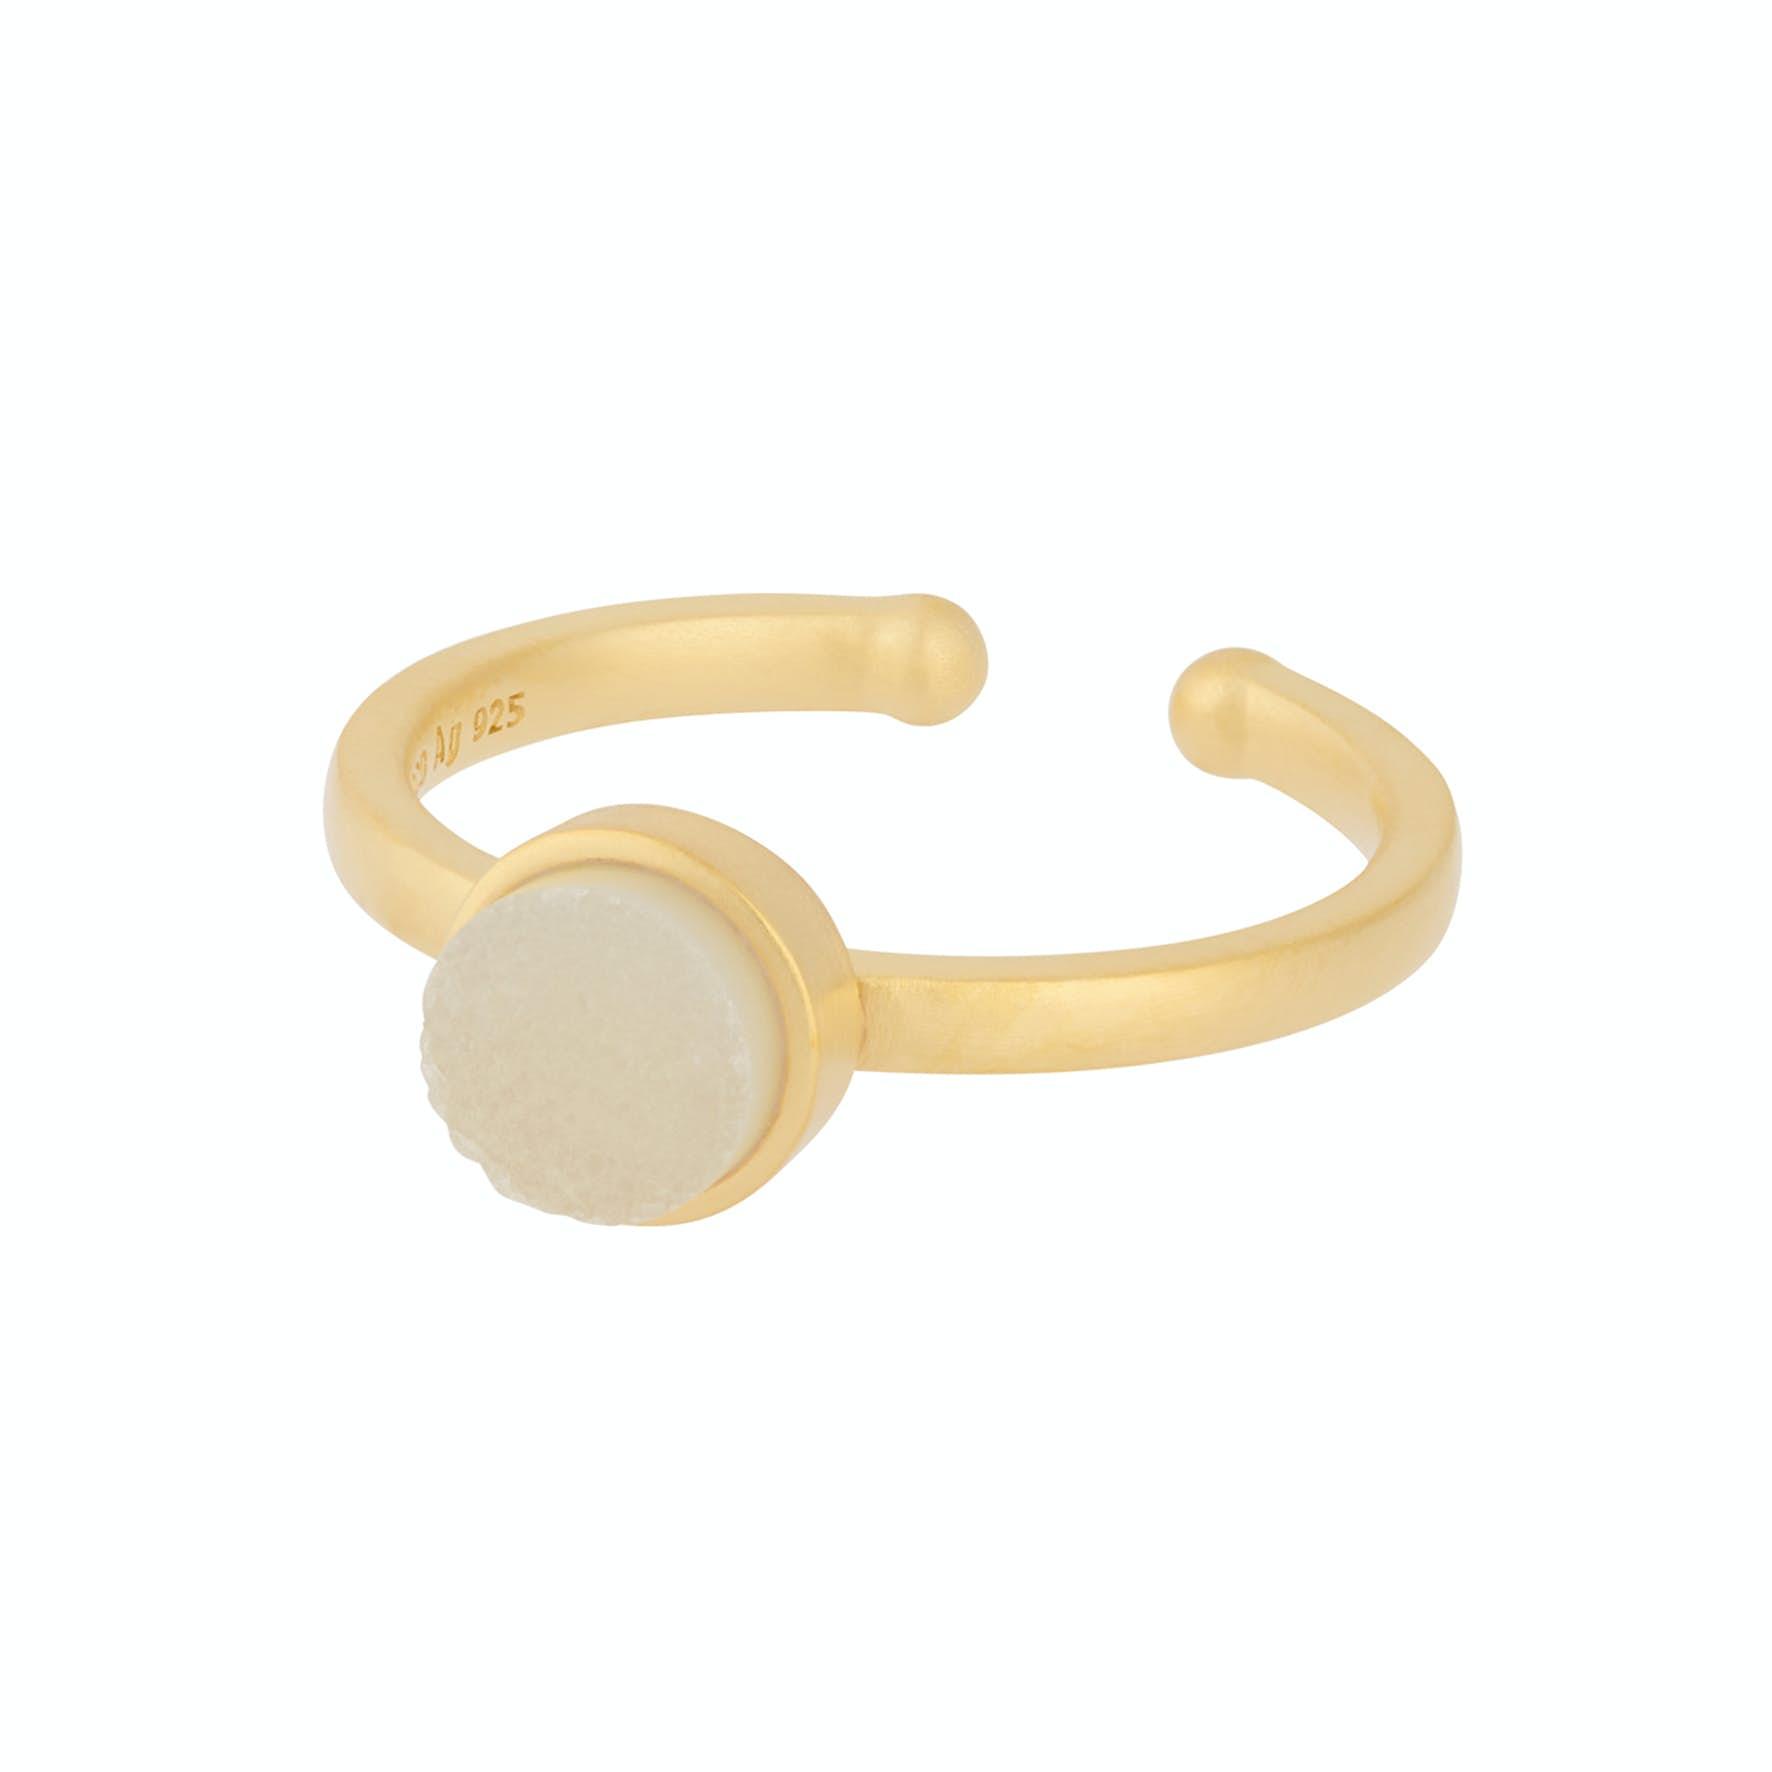 Small Haze Ring von Pernille Corydon in Vergoldet-Silber Sterling 925